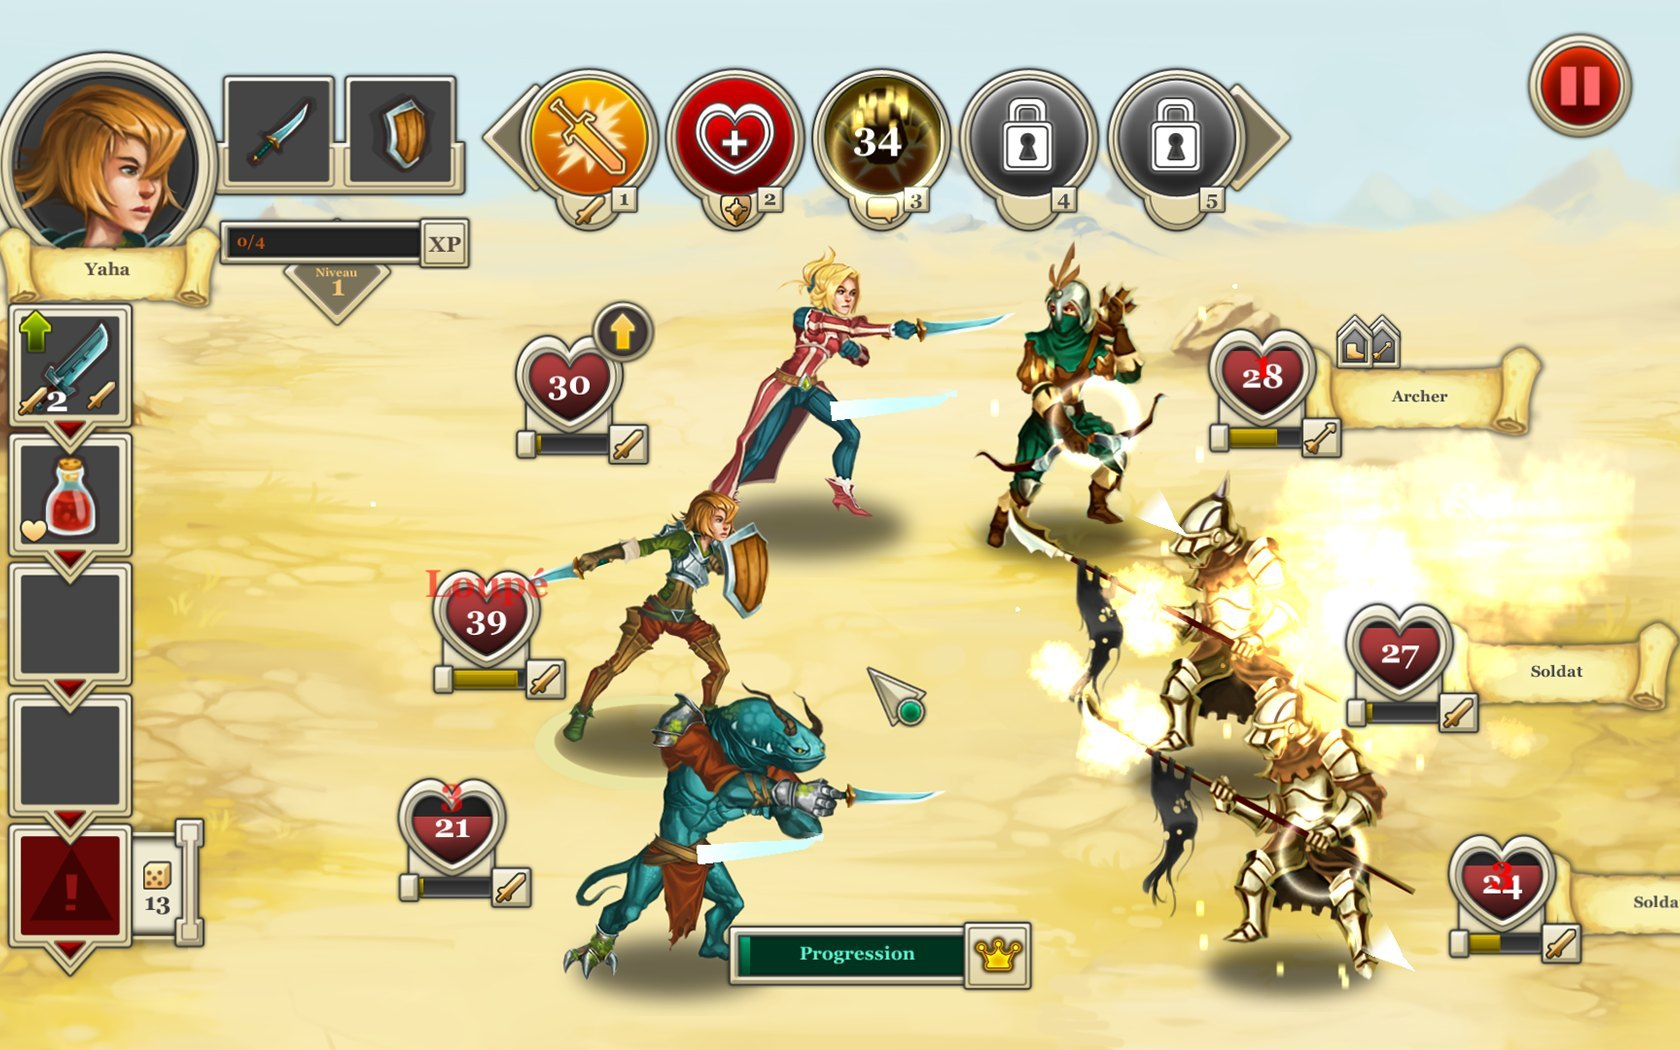 High Resolution Wallpaper | Heroes & Legends: Conquerors Of Kolhar 1680x1050 px